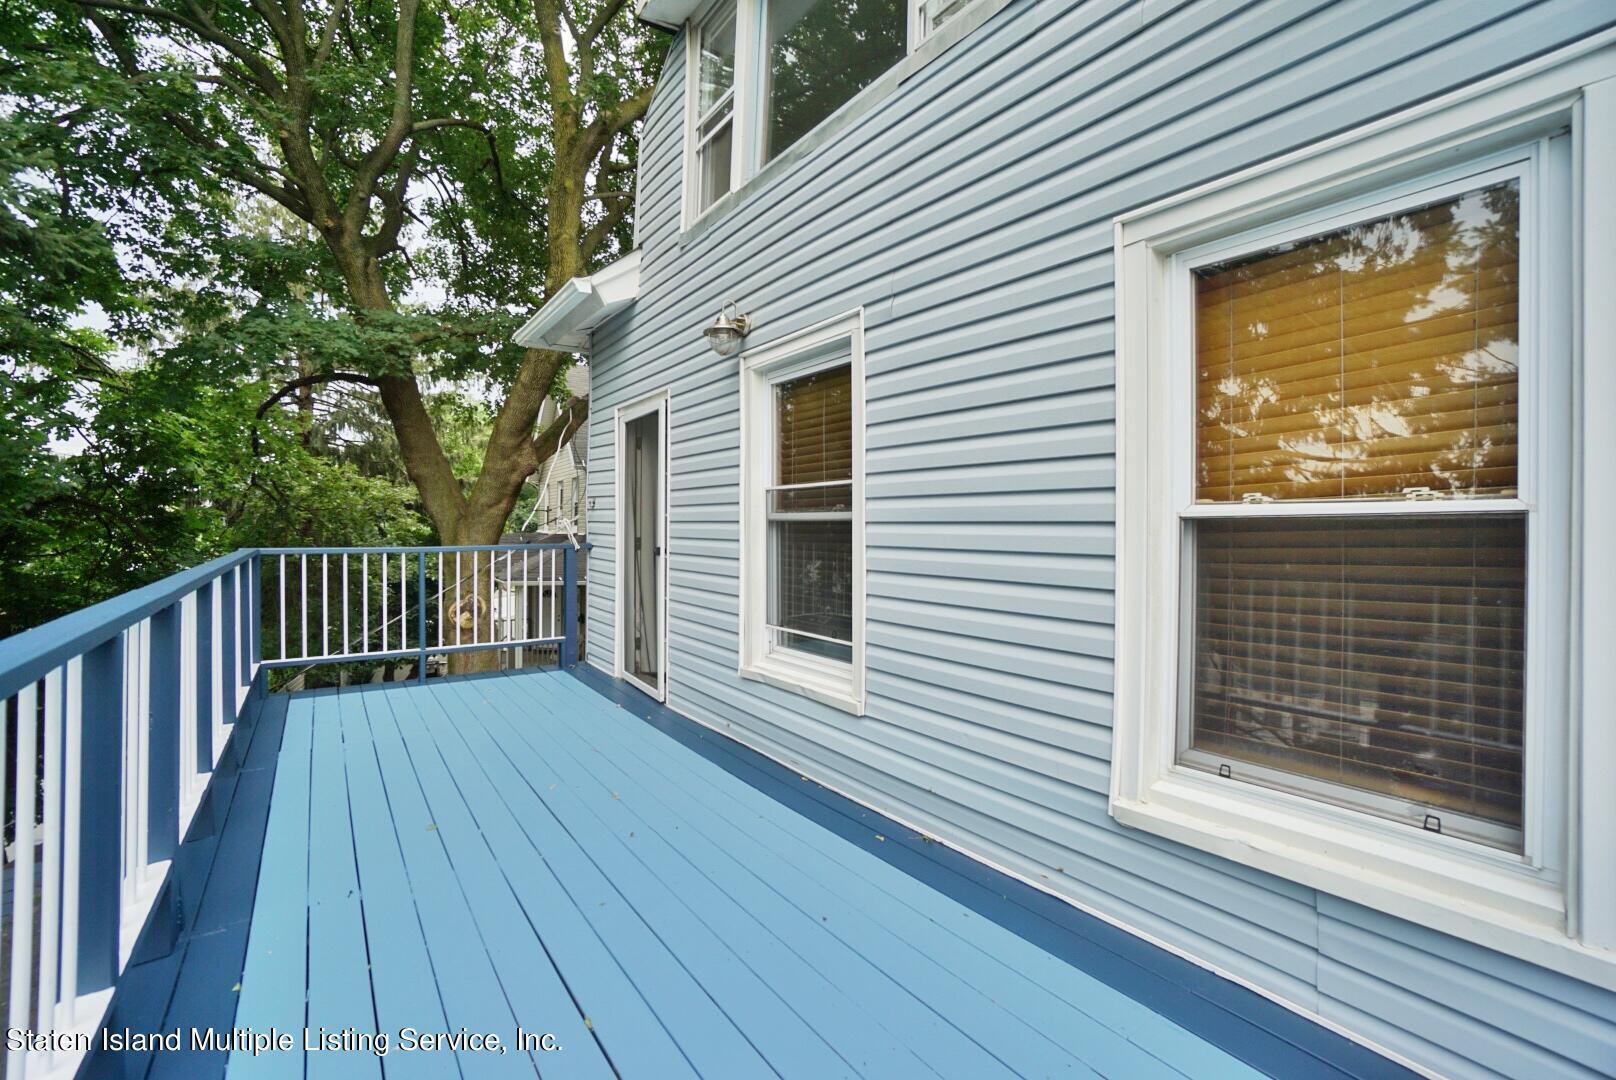 Single Family - Detached 136 York Avenue  Staten Island, NY 10301, MLS-1147575-34